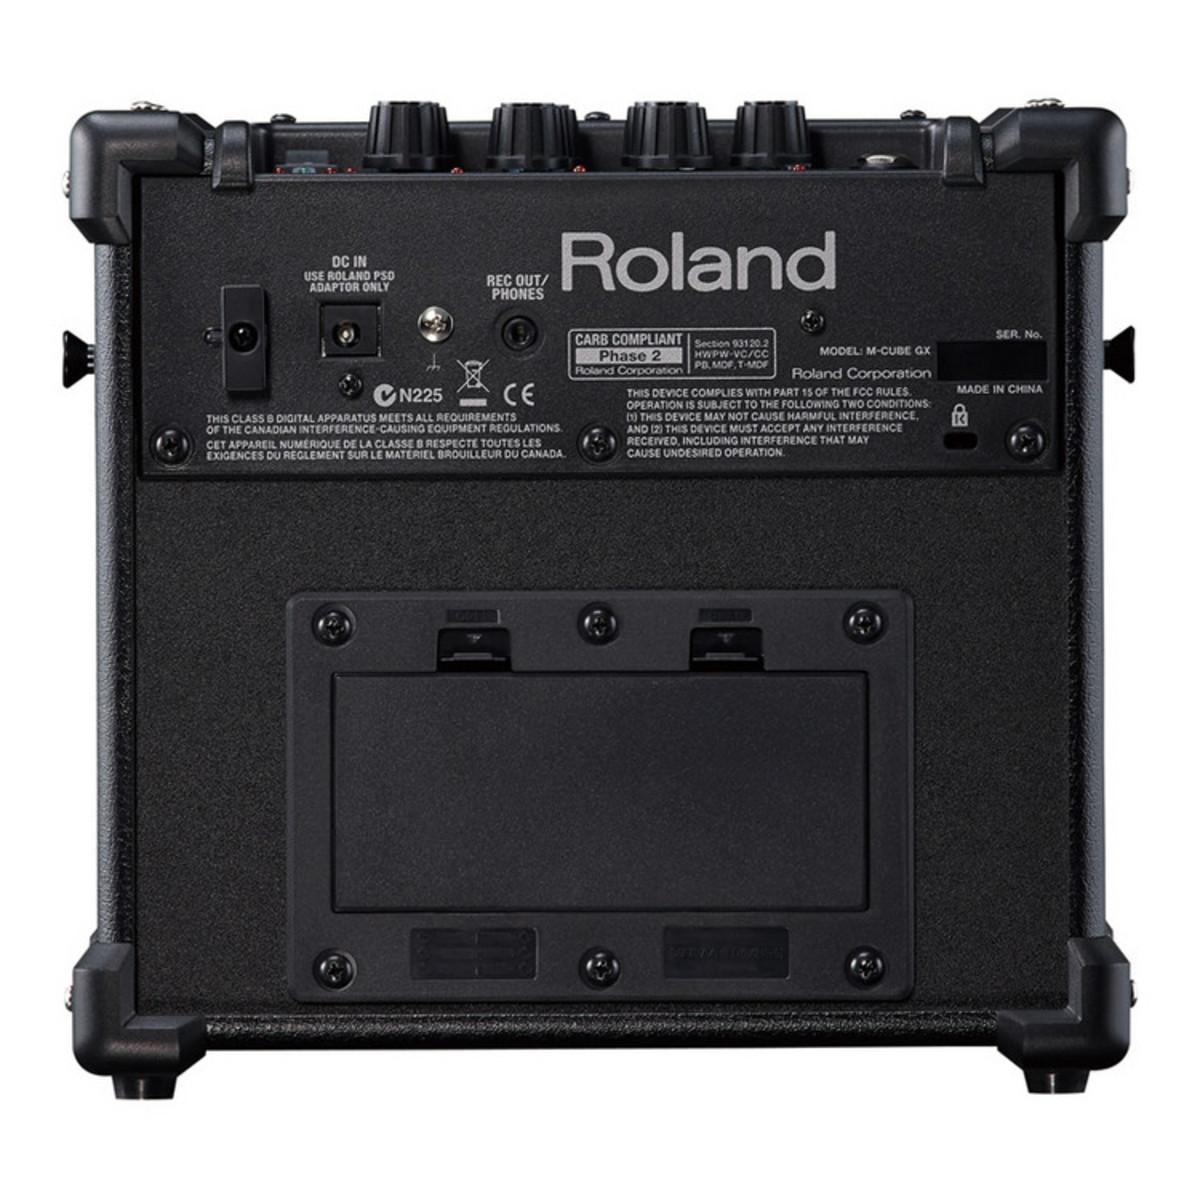 roland micro cube gx guitar amplifier black at. Black Bedroom Furniture Sets. Home Design Ideas